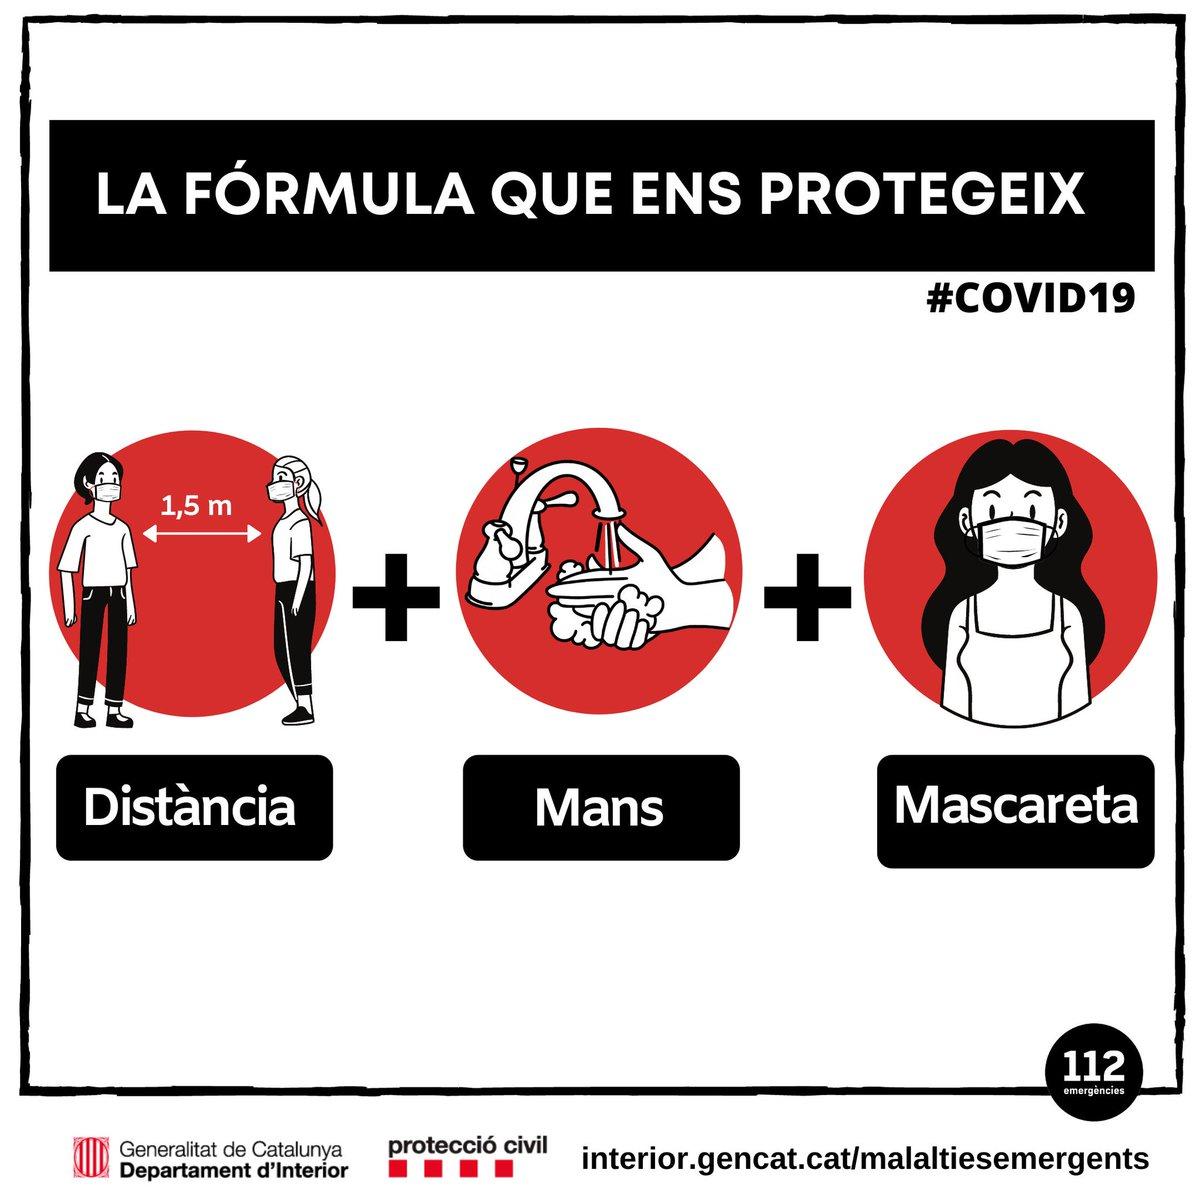 #Bondia  No ho oblidis:   ✅ Posa't mascareta  ✅ Renta't les mans  ✅ Respecta la distància   #coronavirus #COVID19 #DistanciaMansMascareta #ProteccioCivil https://t.co/LBkPxjZ8l0